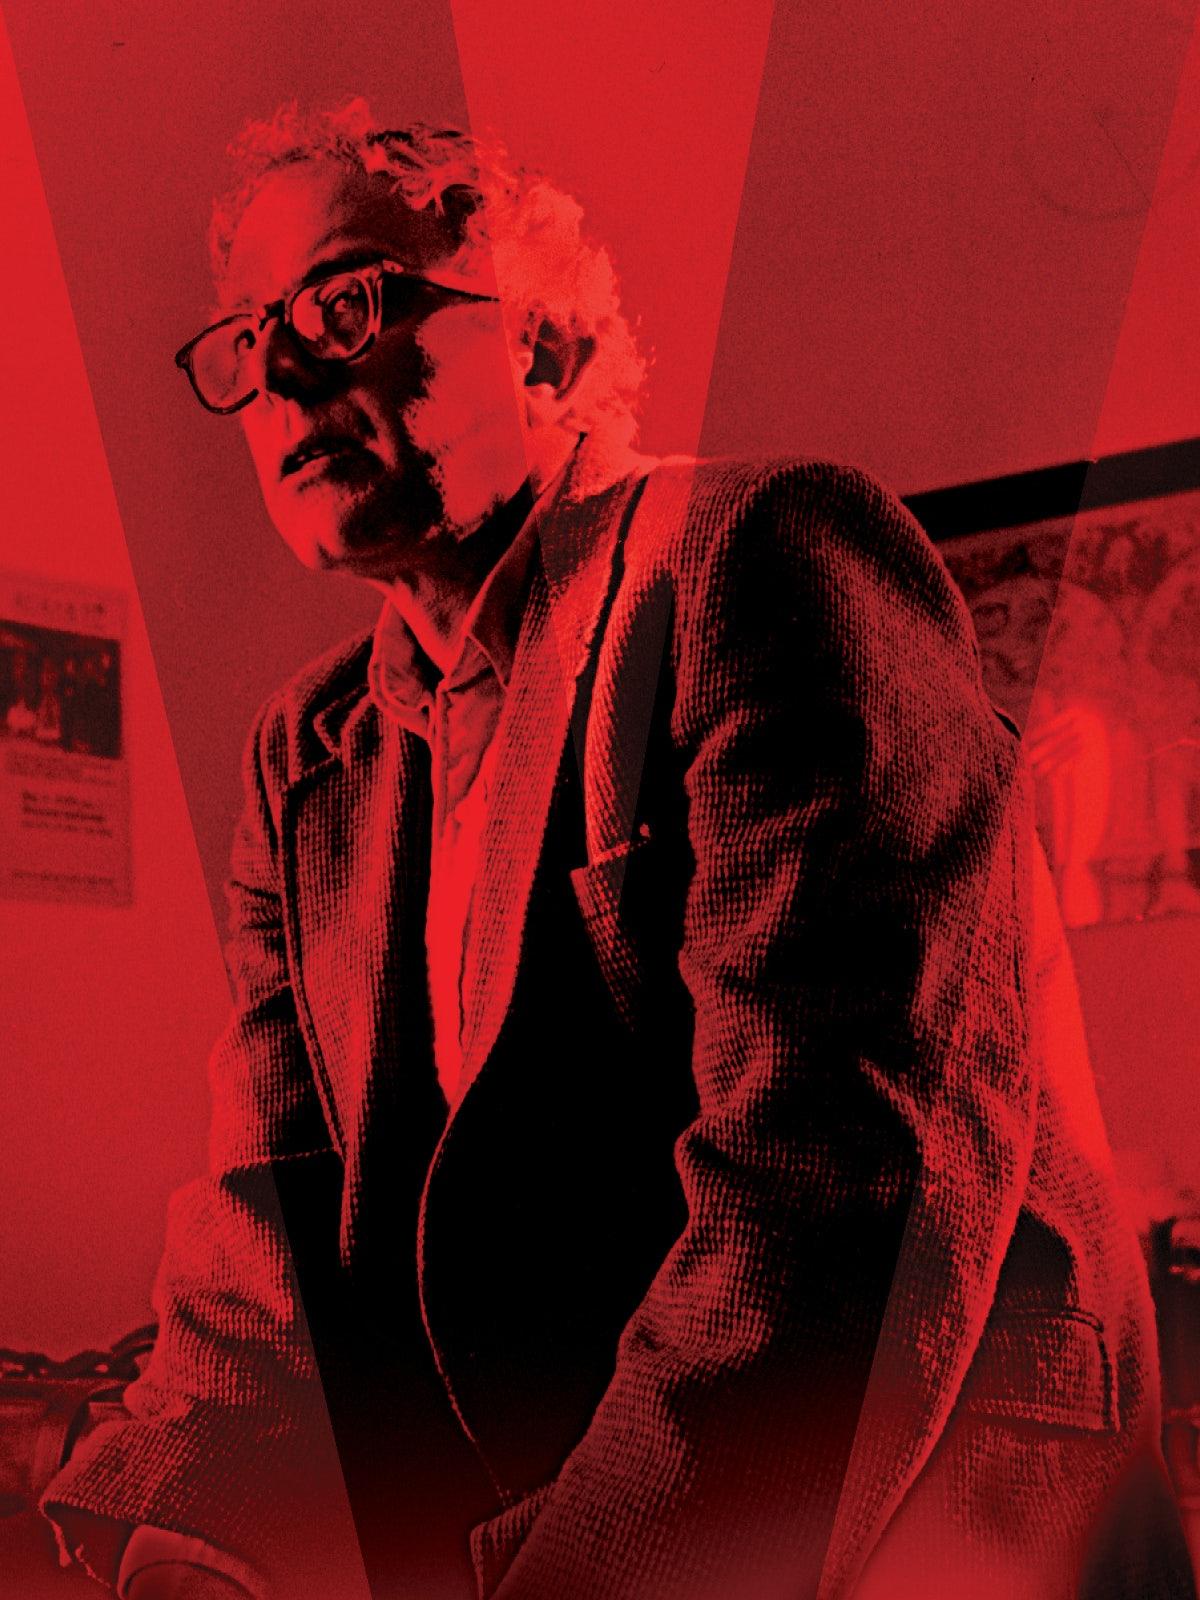 Bernie's Red Vermont | The New Republic